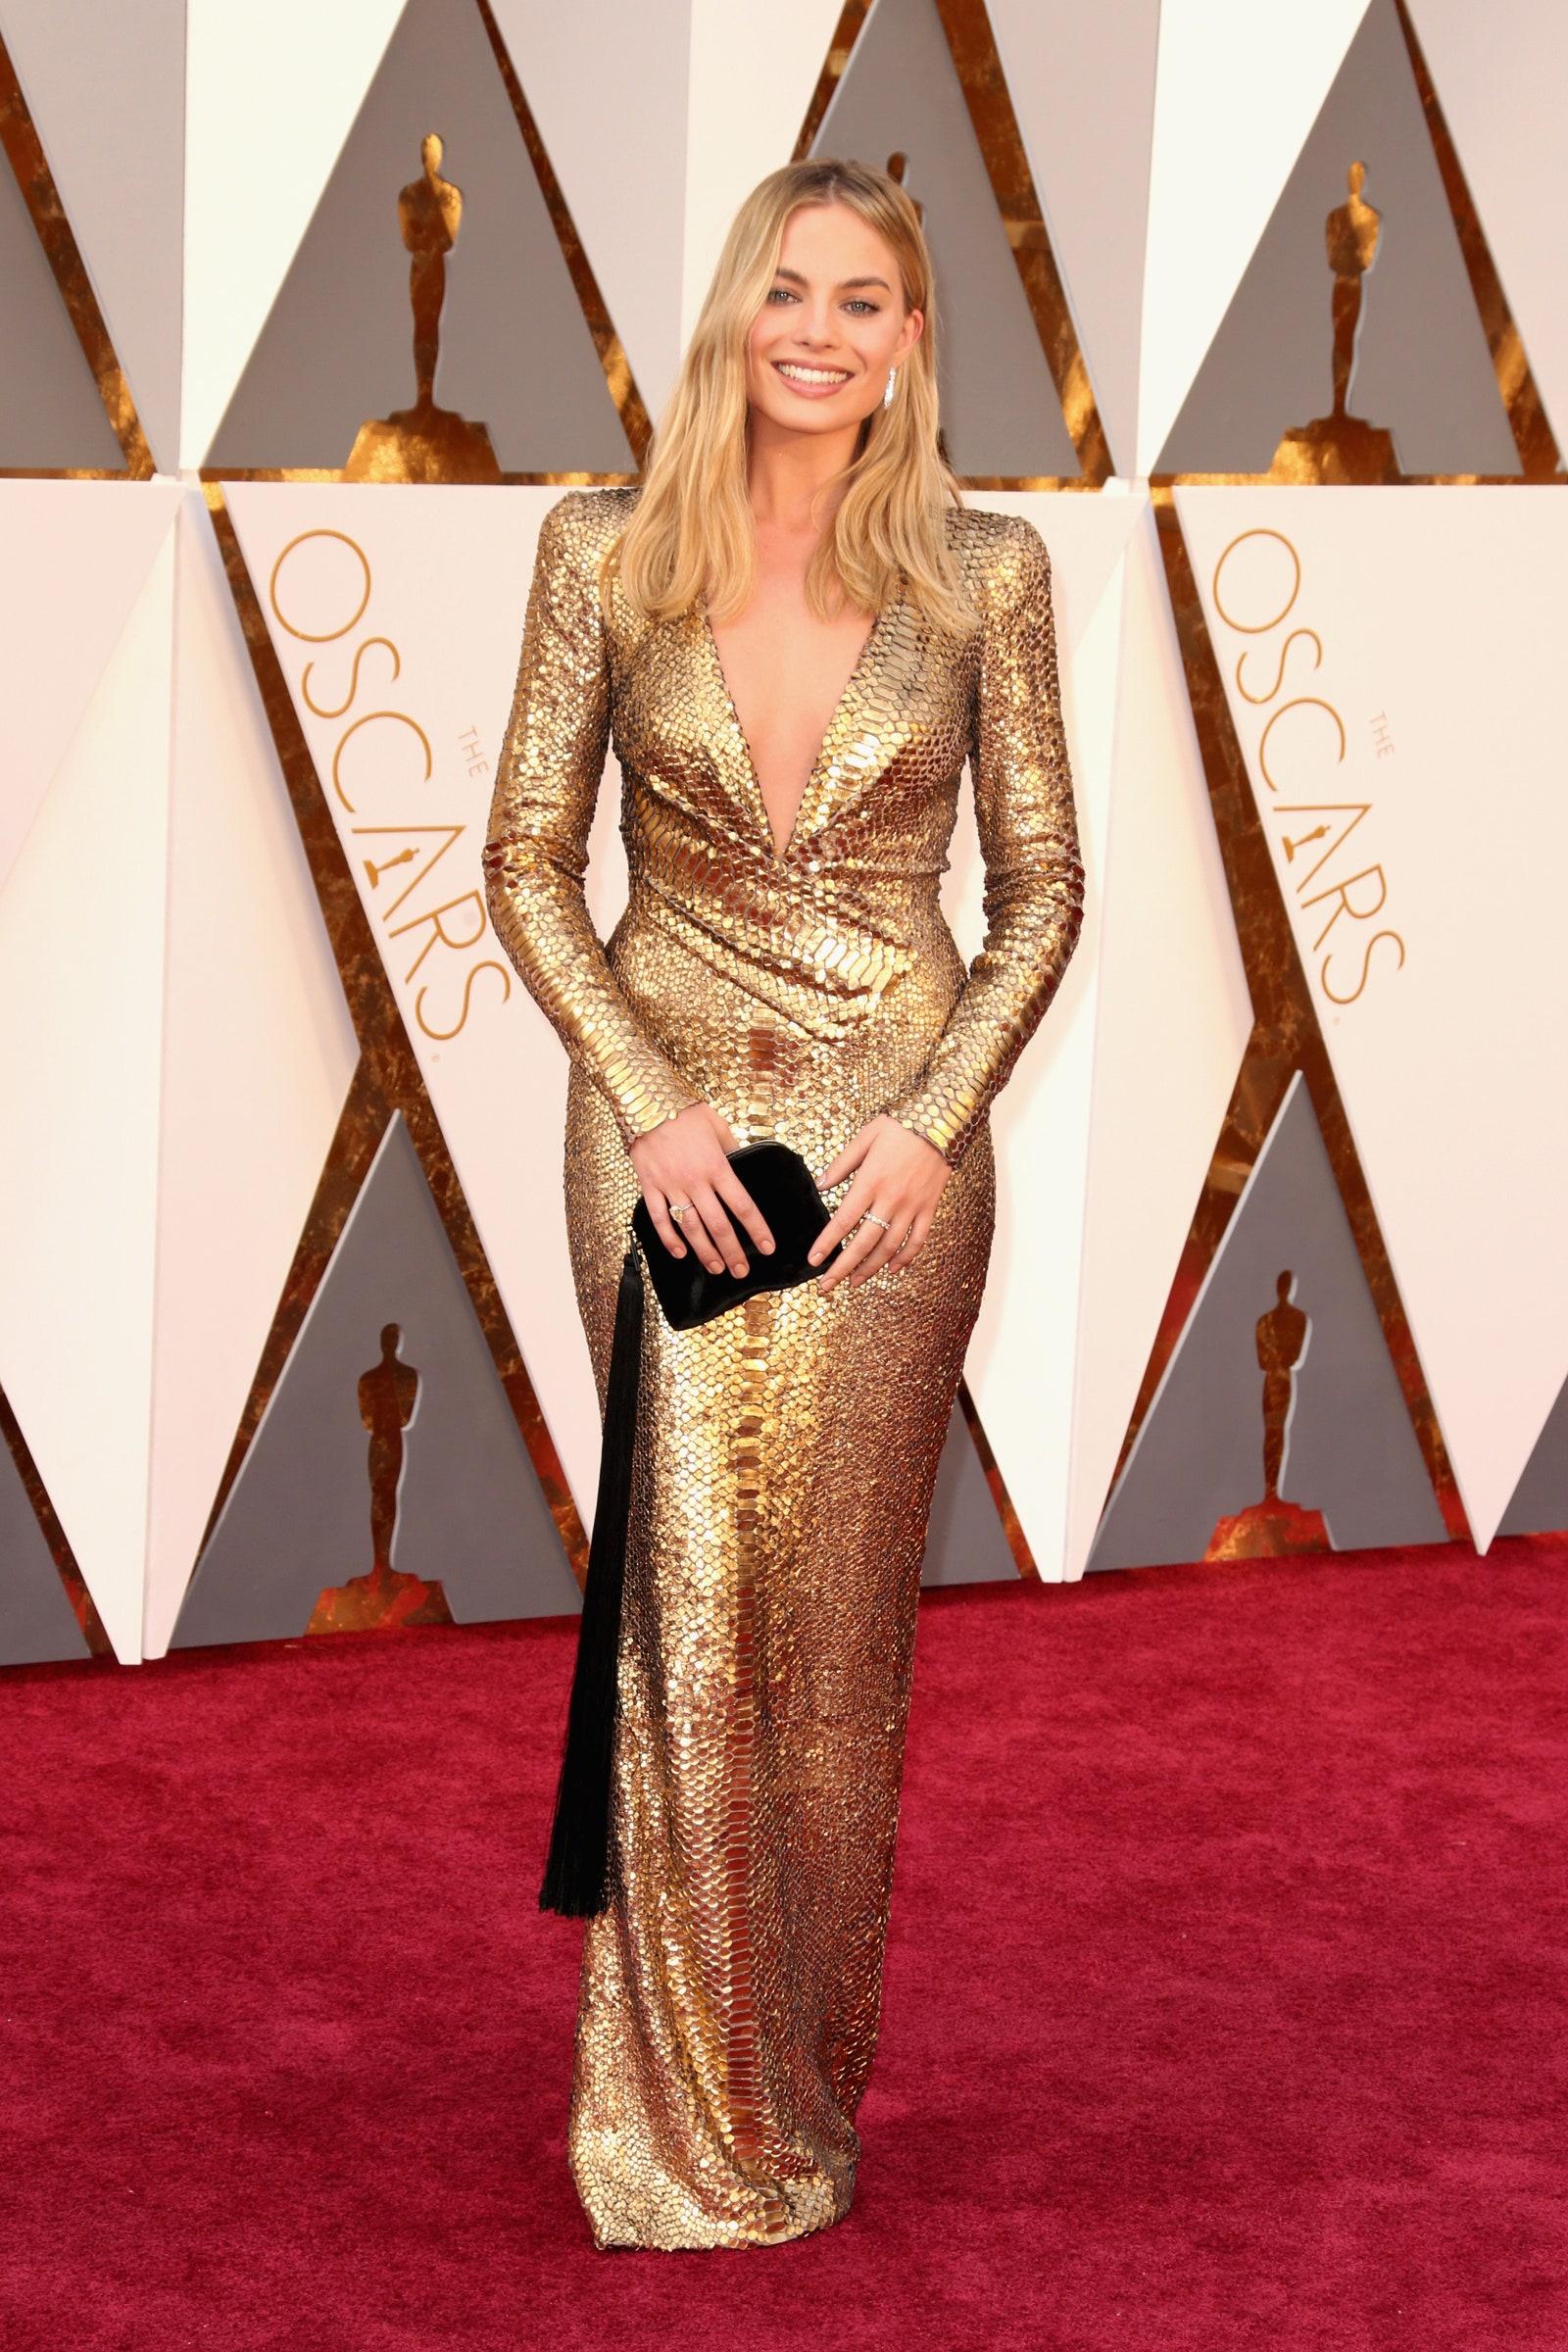 Margot Robbie Wear A Long Sleeves Deep Cut V-Neck Gold Gown